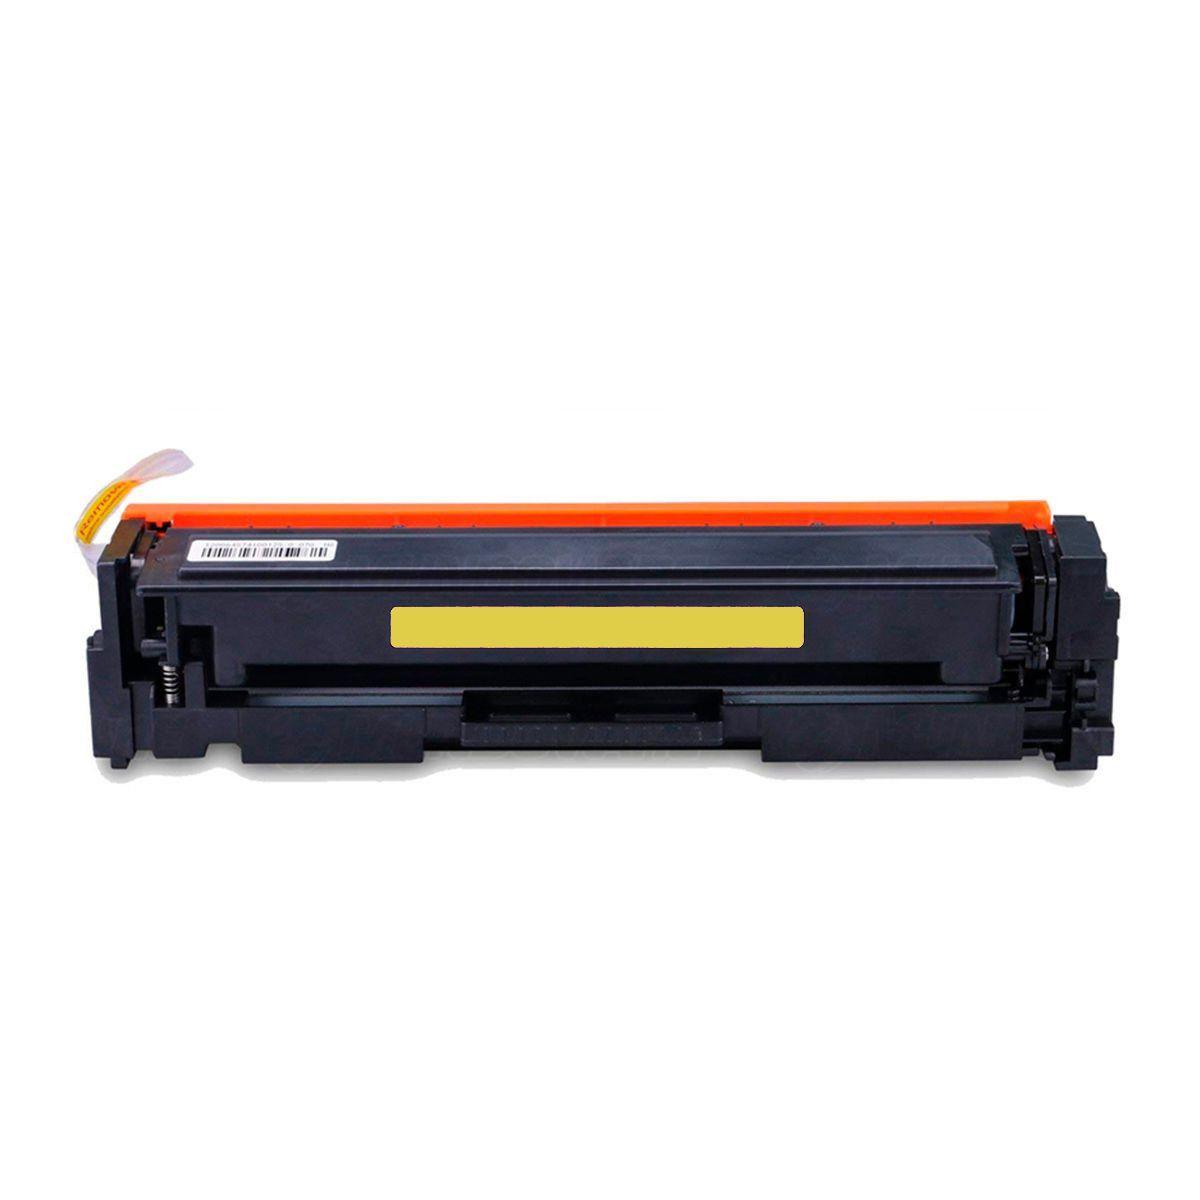 Compatível: Toner CF502A 502A 202A para impressora HP M254dn M254nw M281nw M281fdn M281fdw M280nw / Amarelo / 1.300